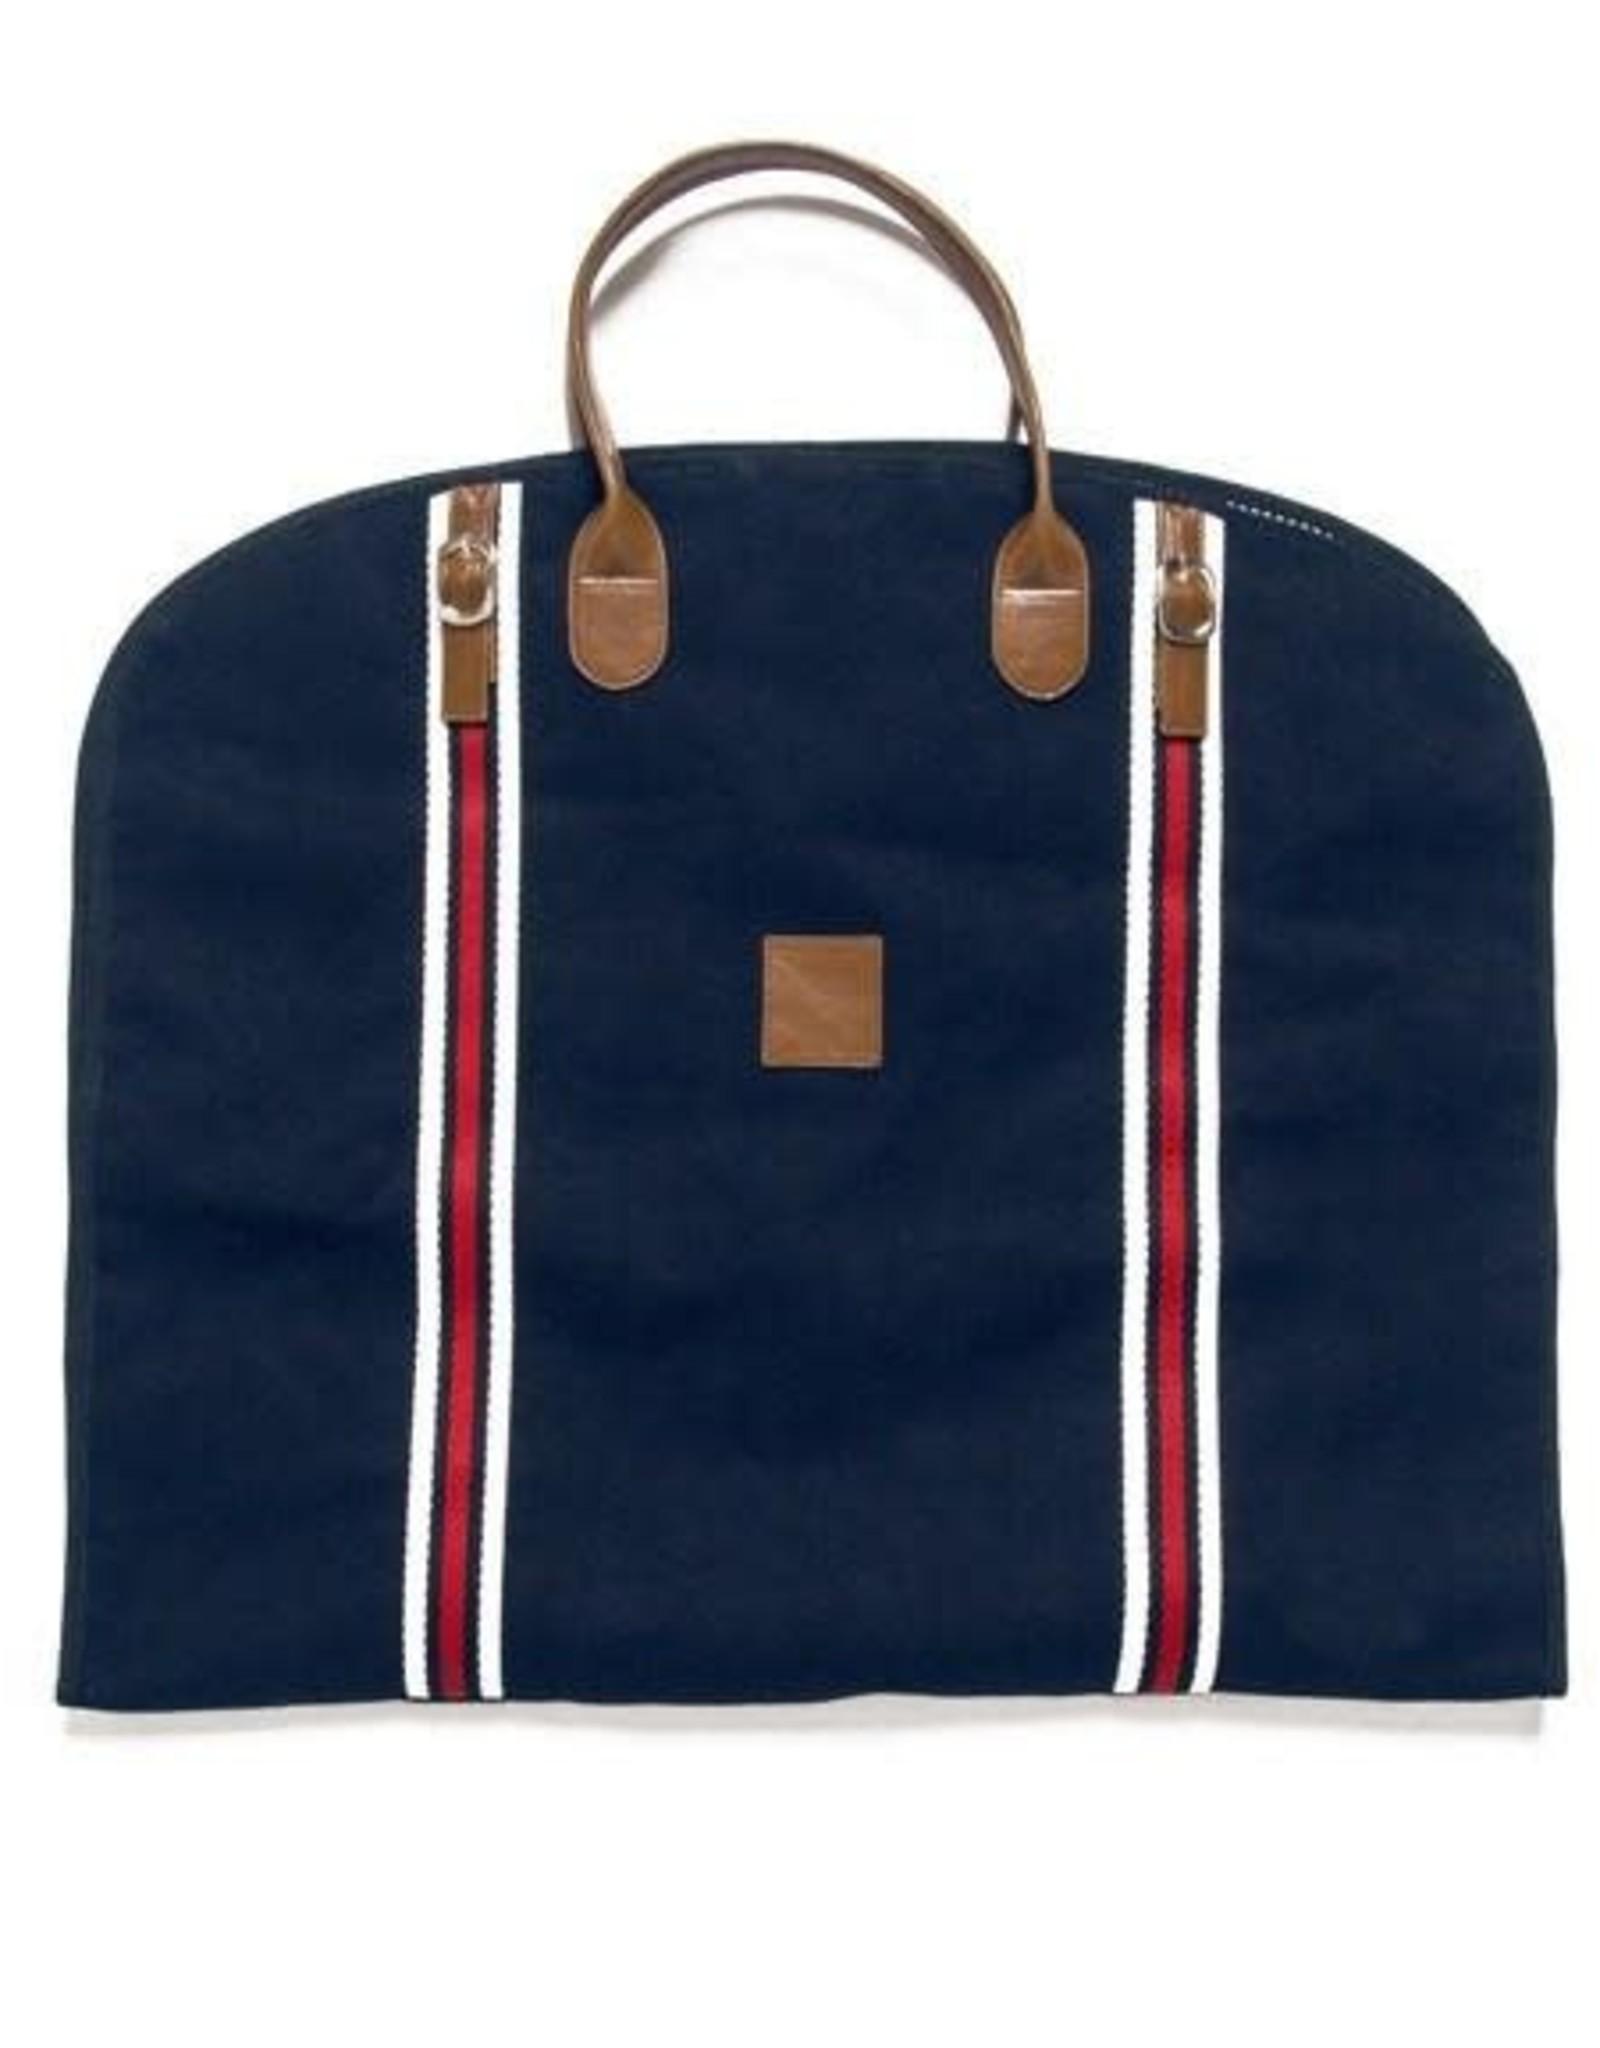 Brouk Original Garment Bag, Navy Blue